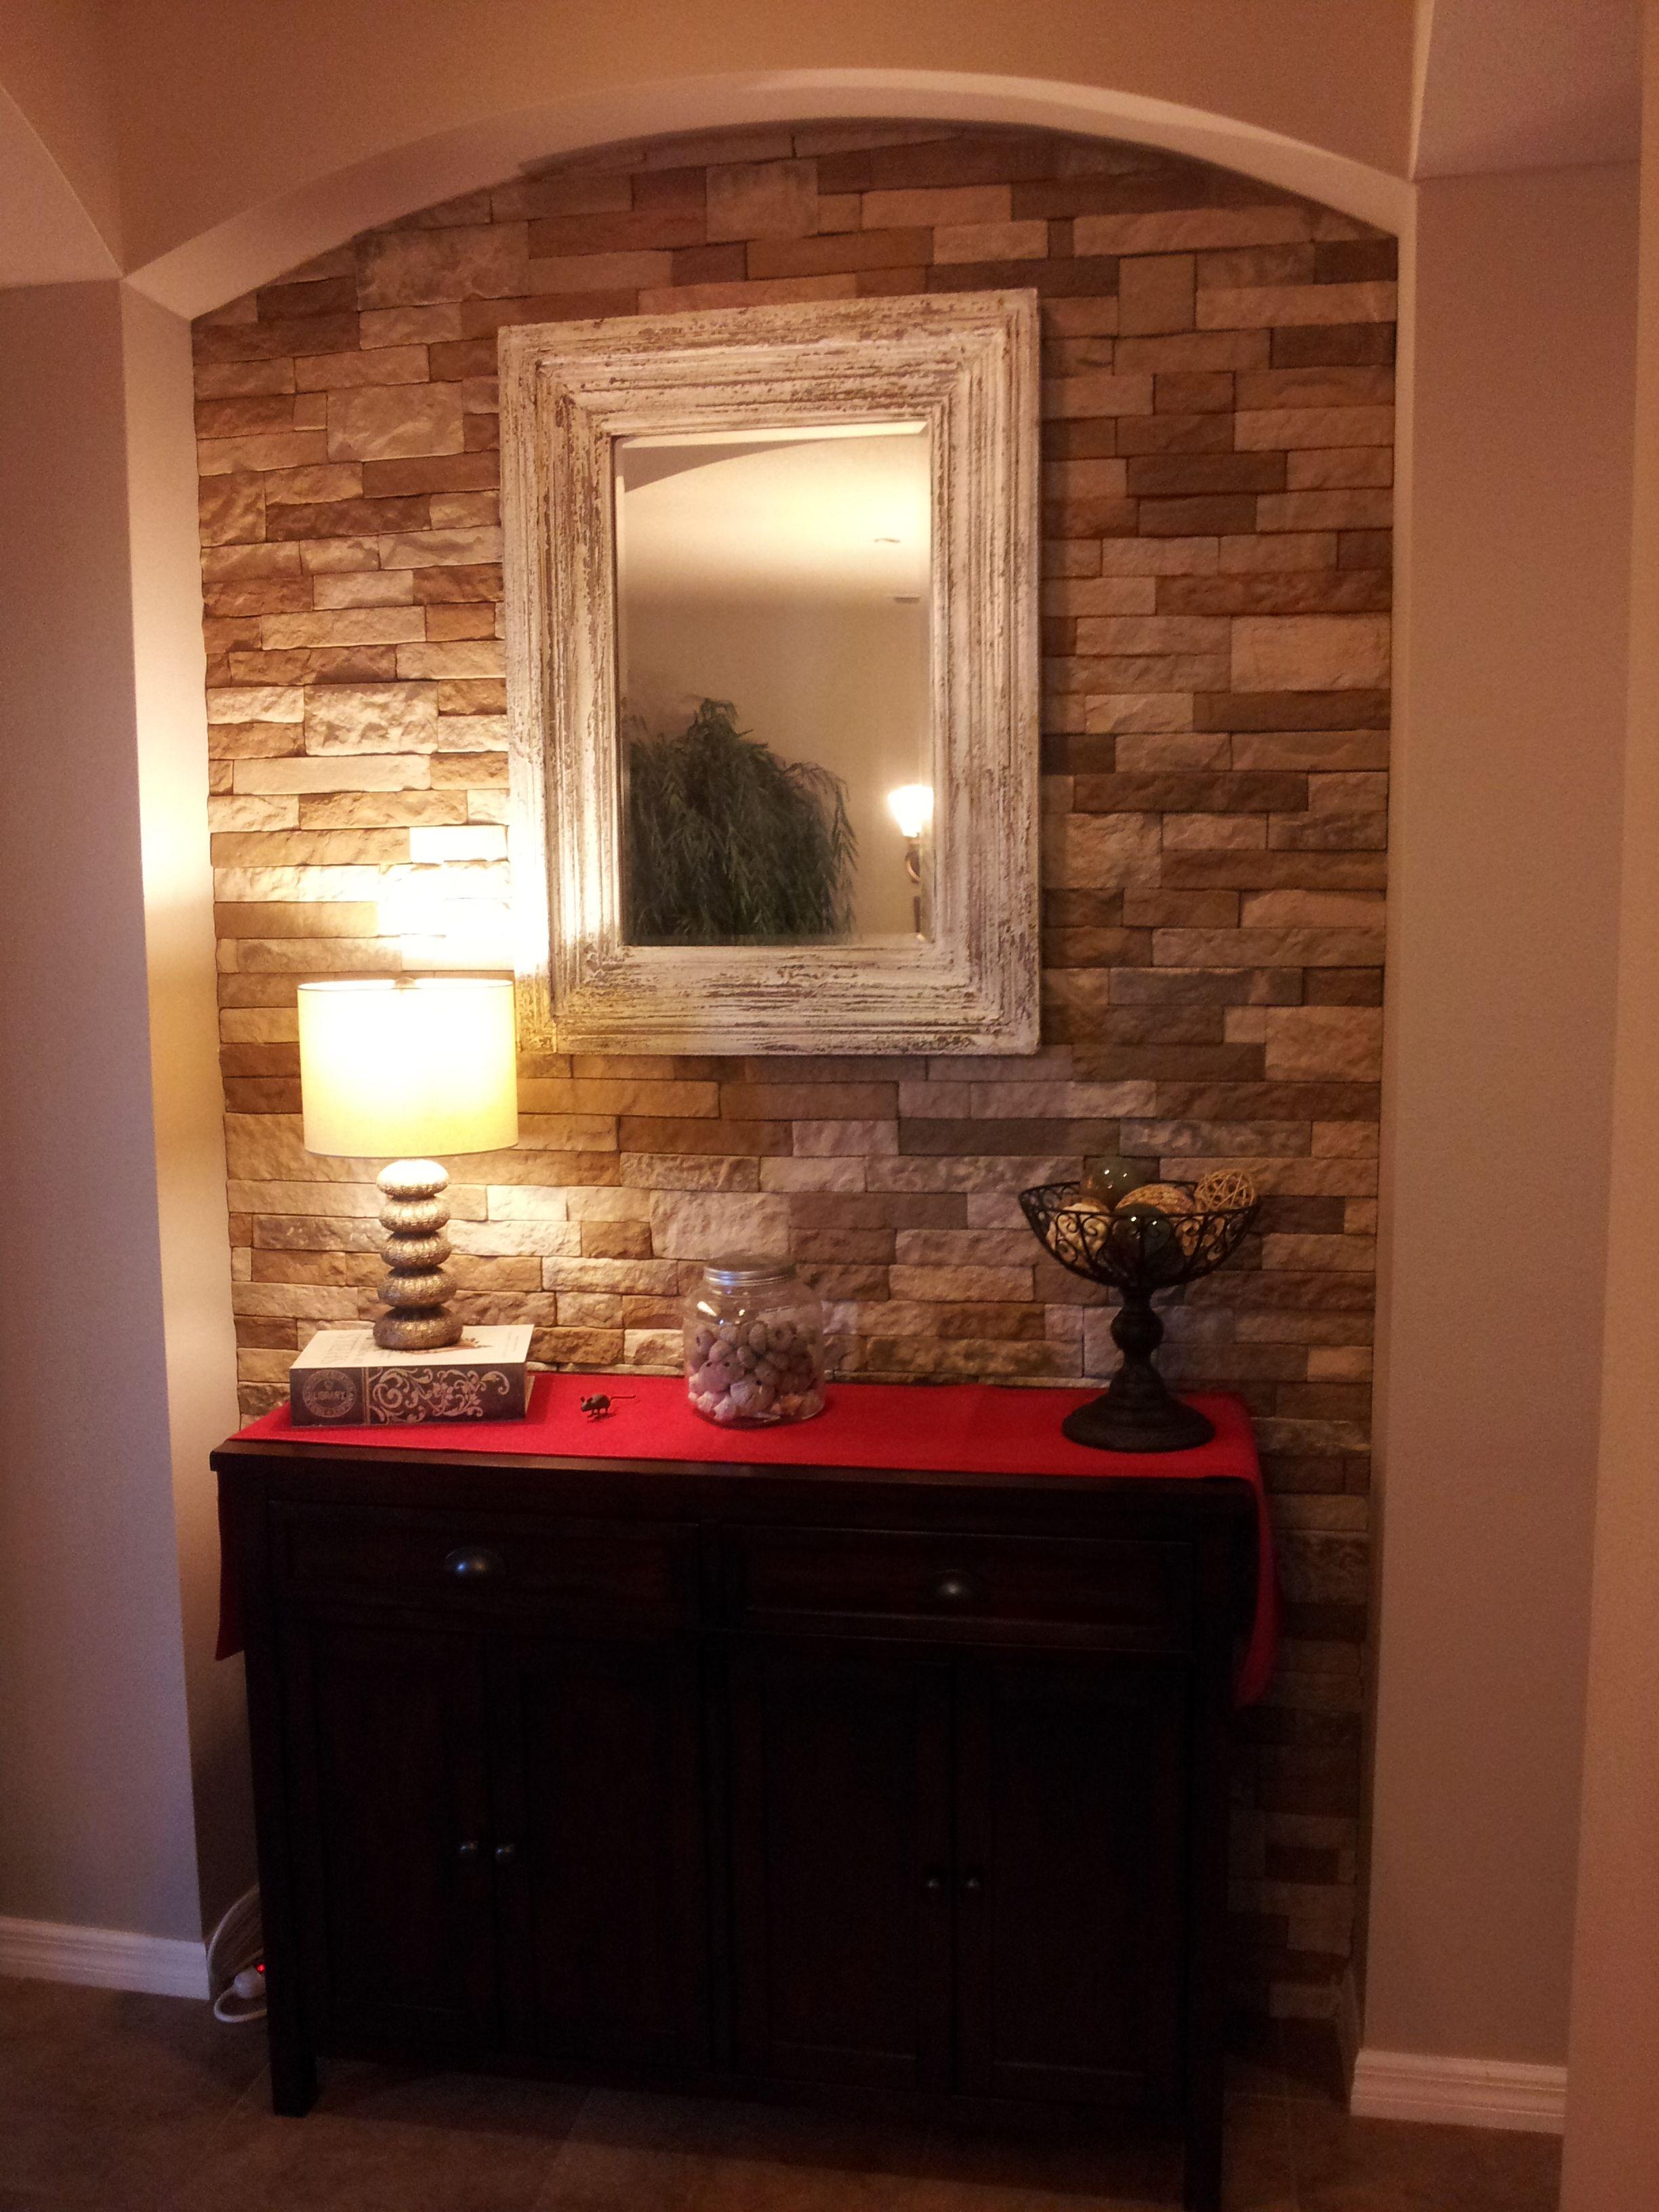 Must see Airstone Accent Wall Bathroom - 1a3db78c4788fb6f82e13c22fe656c6c  Gallery_798762.jpg